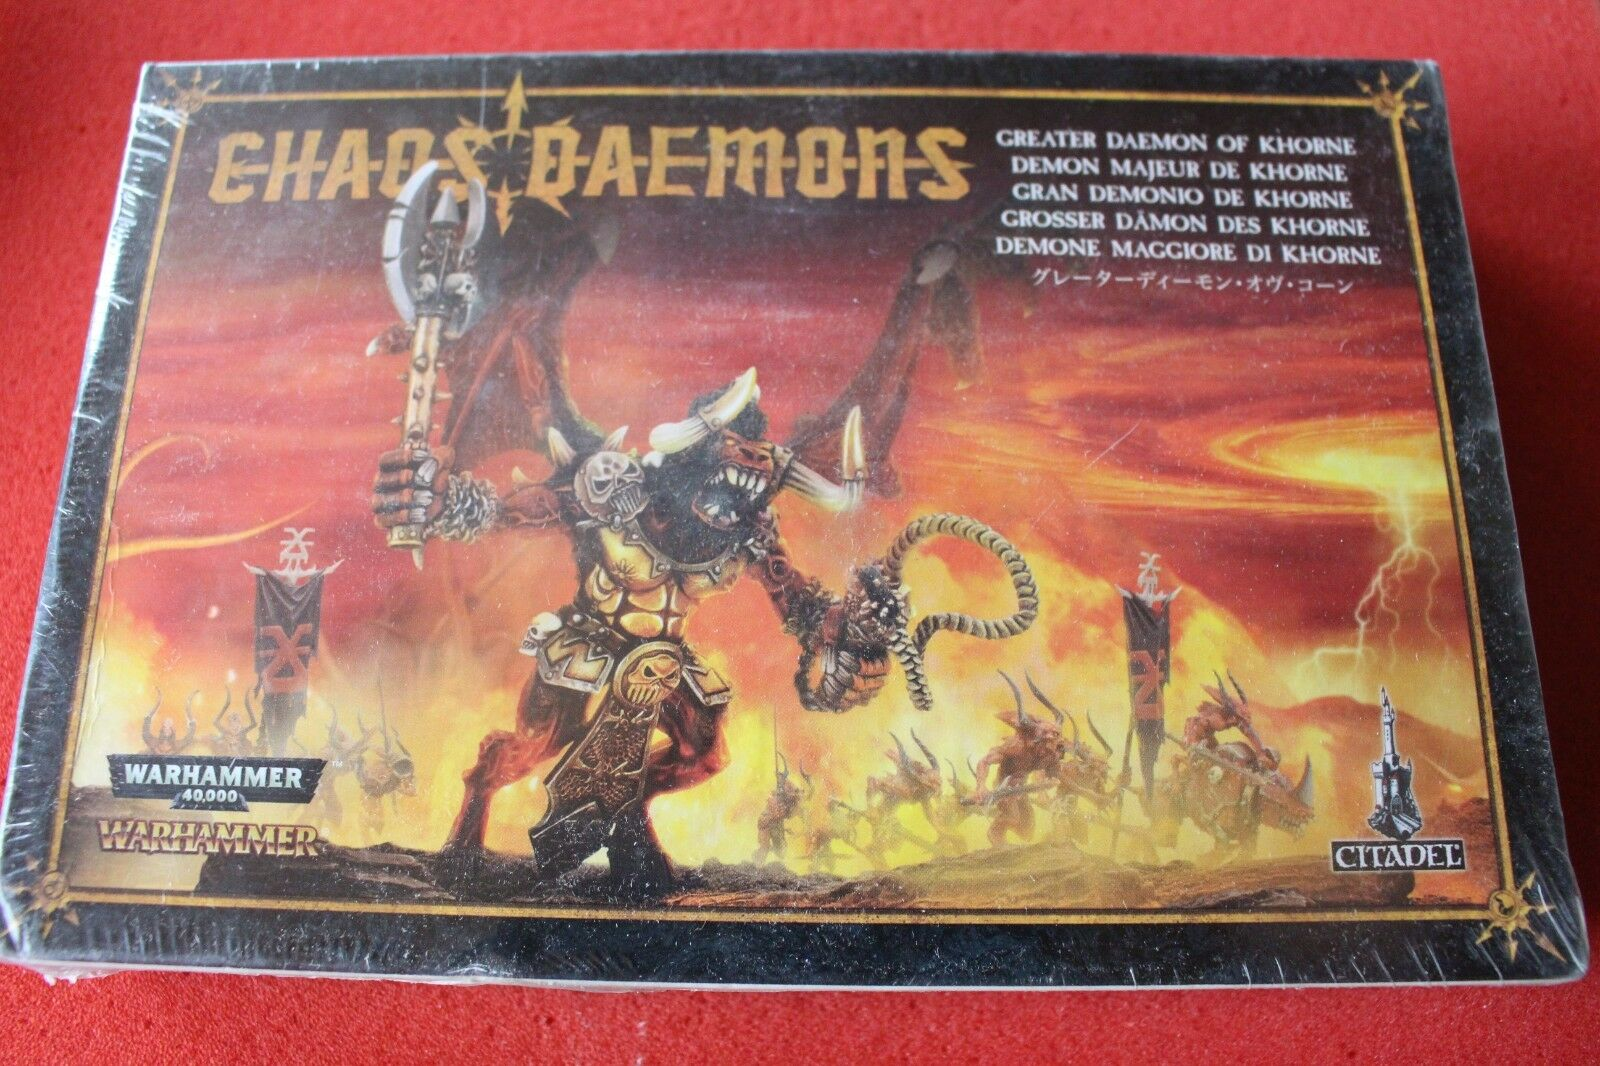 Games Workshop Warhammer Bloodthirster Greater Daemon of Khorne Metal Chaos BNIB